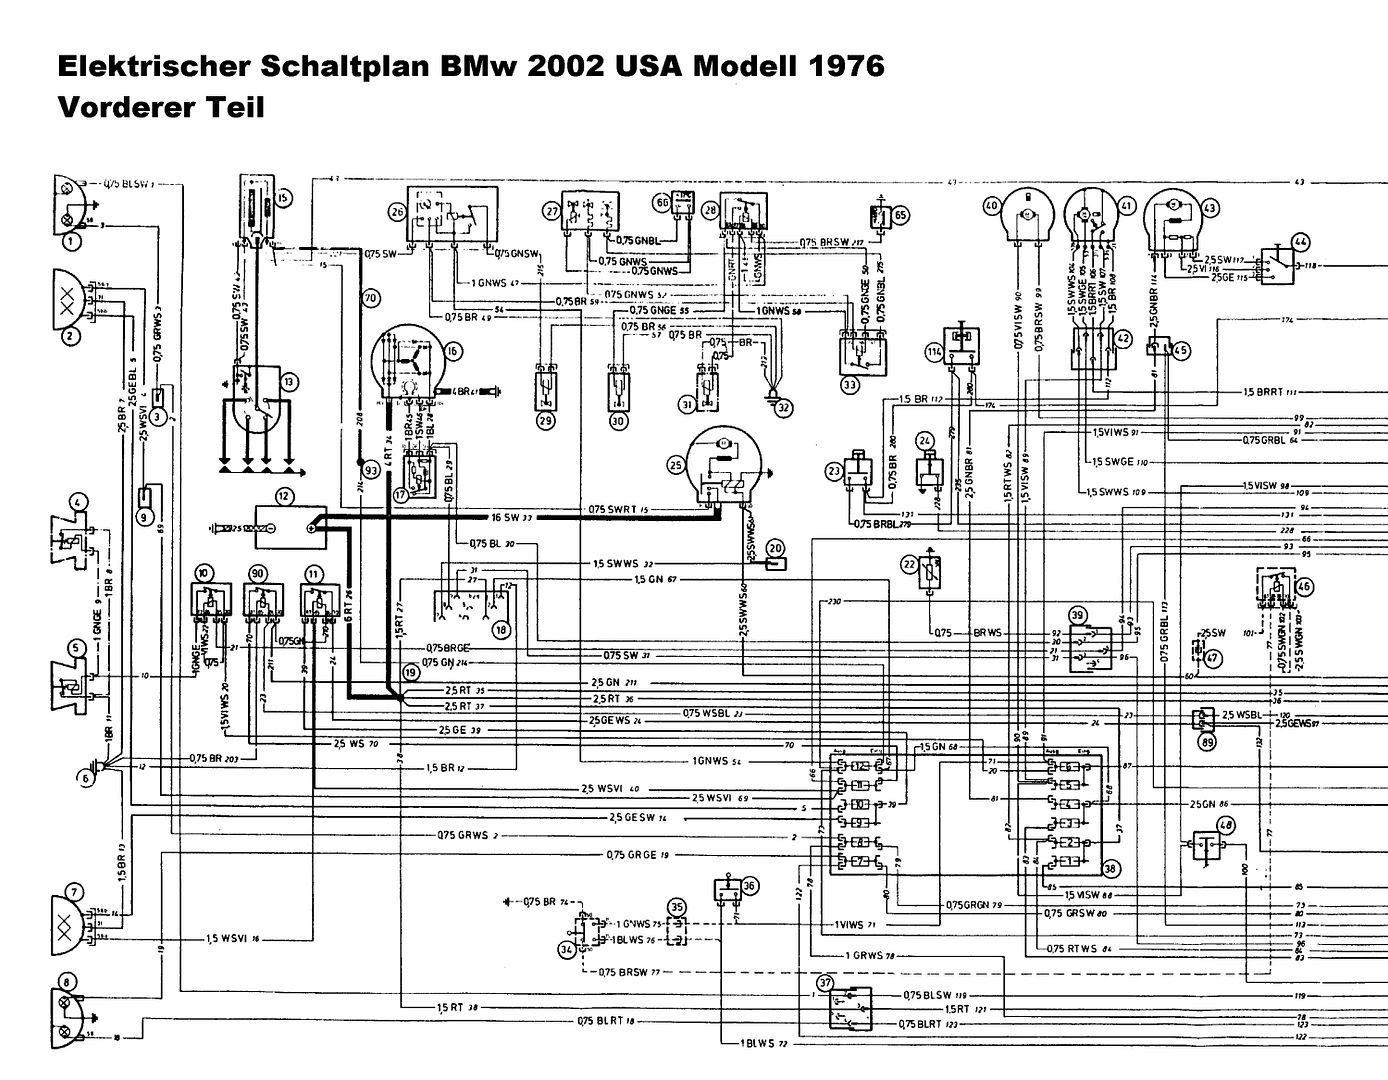 Bmw 1974 2002 Auto Wire Diagram - Wiring Diagramspsicologoafaenza.it